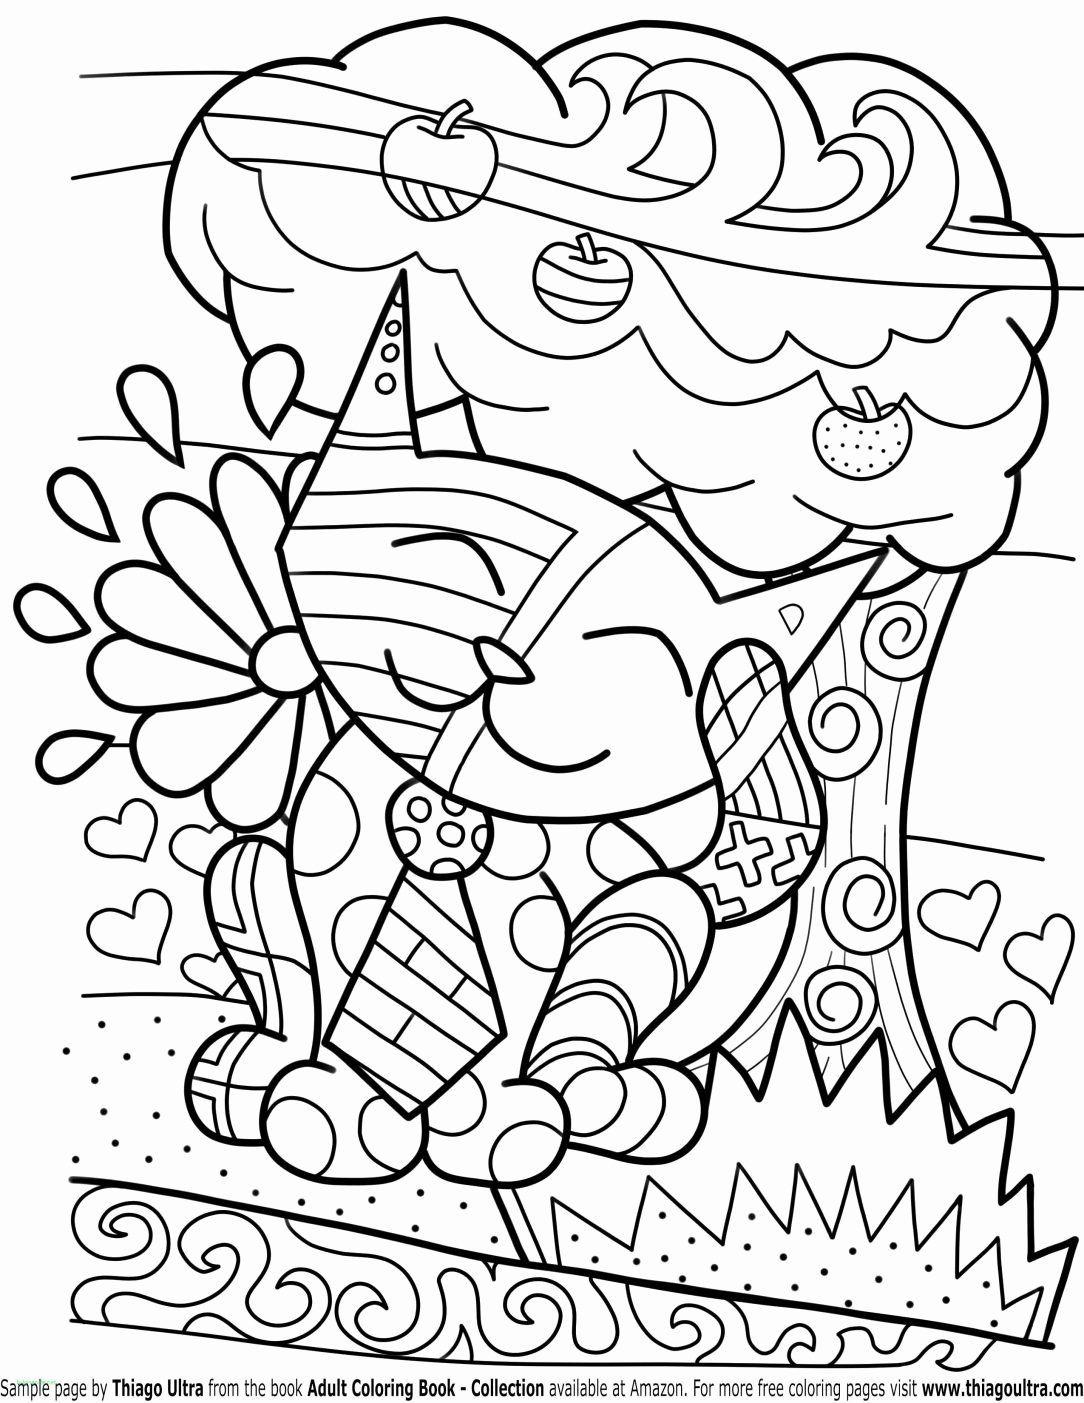 Alphabet Coloring Book Printable Pdf Elegant Coloring Ideas 62 Tremendous Free Coloring Sheets P Bird Coloring Pages Mandala Coloring Pages Fall Coloring Pages